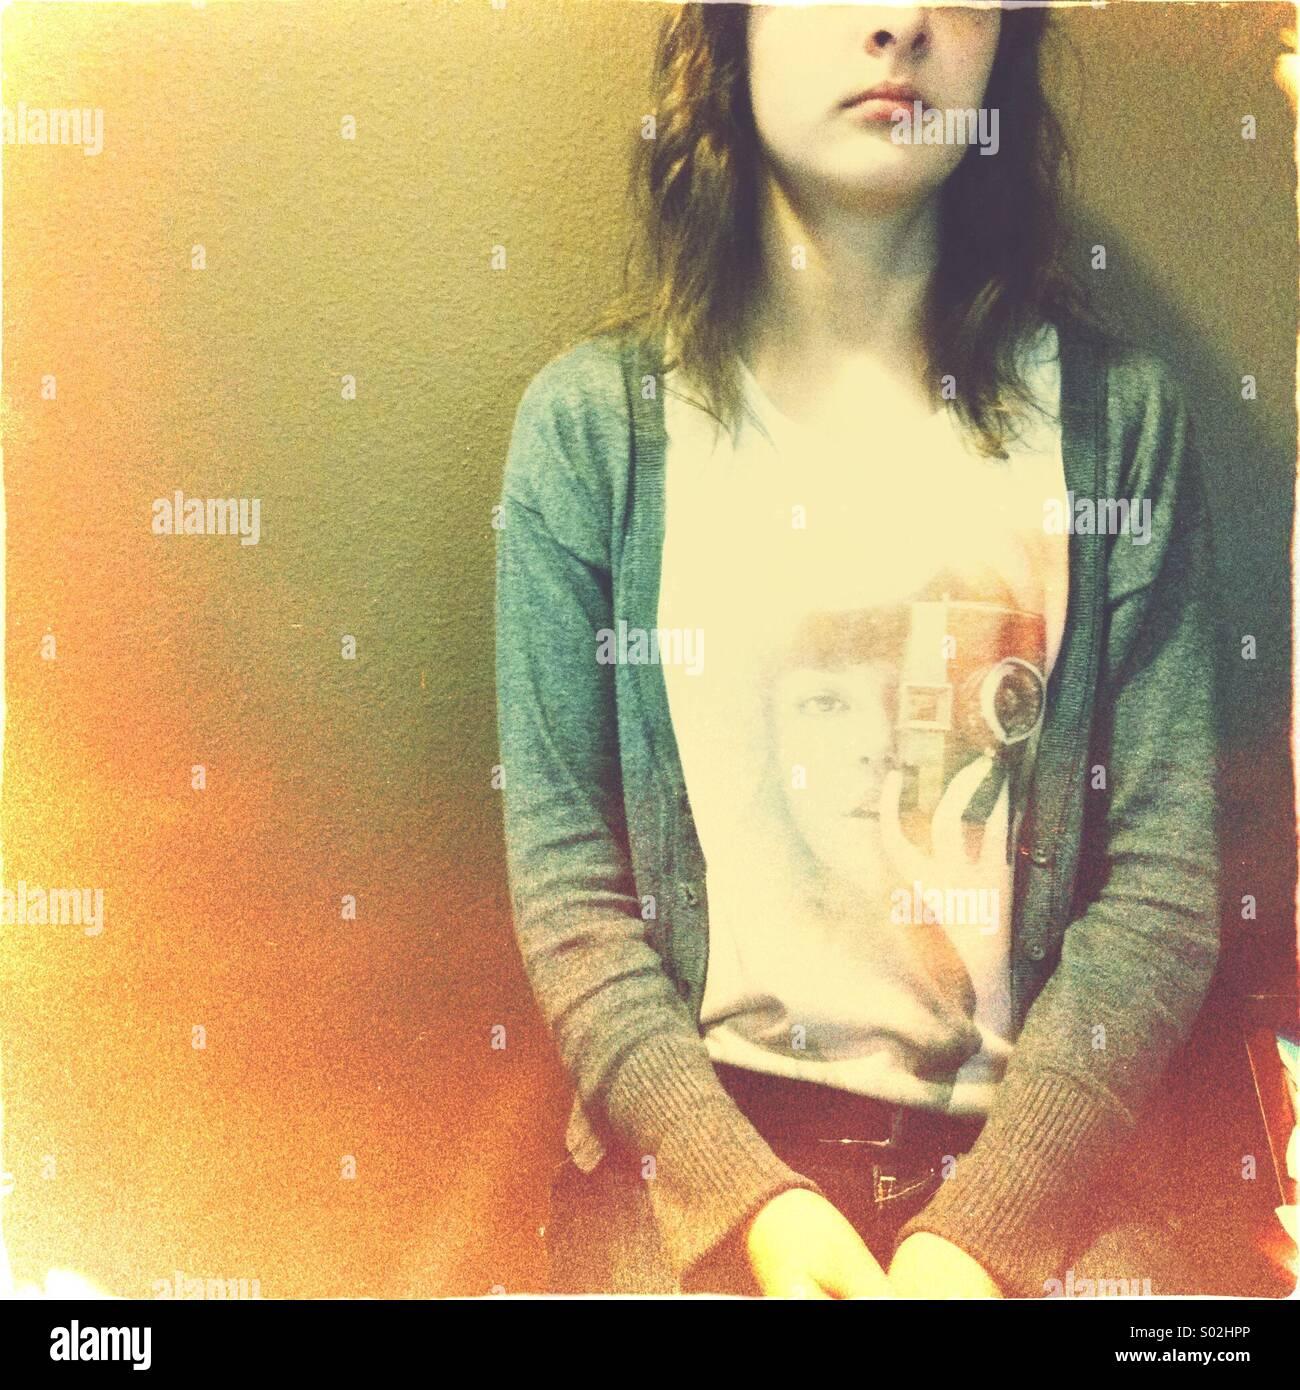 girl wearing camera t-shirt - Stock Image